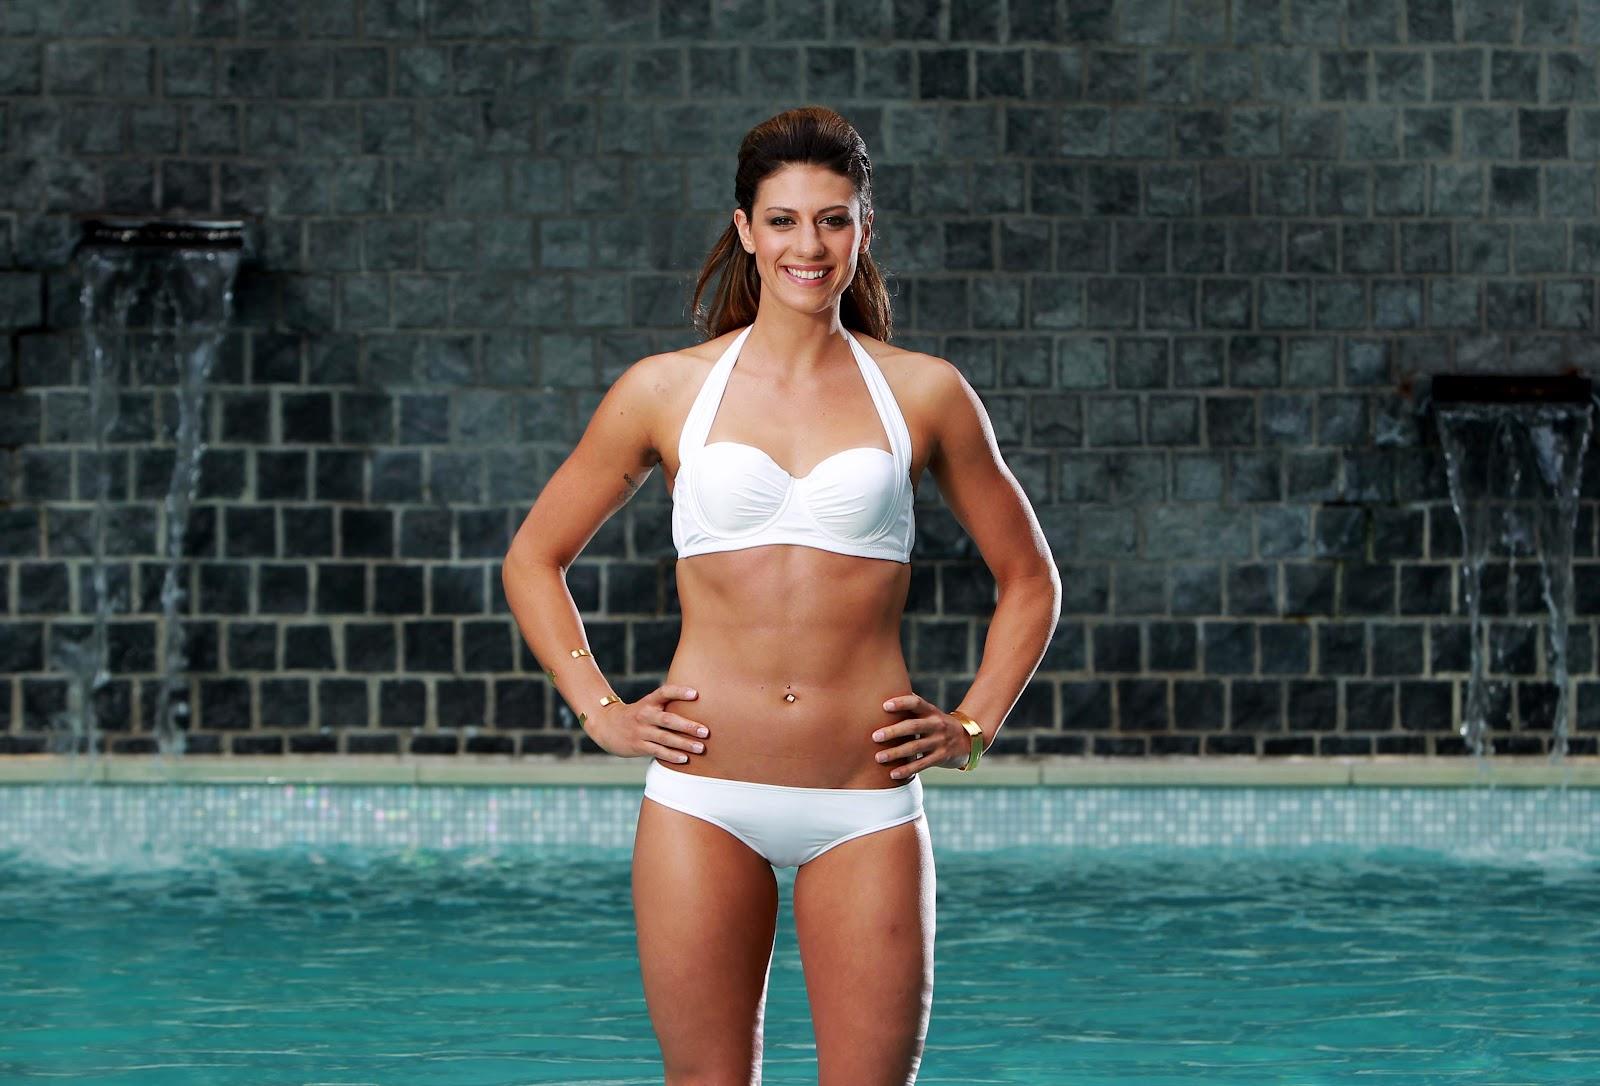 Hot Hot Stephanie Rice naked photo 2017